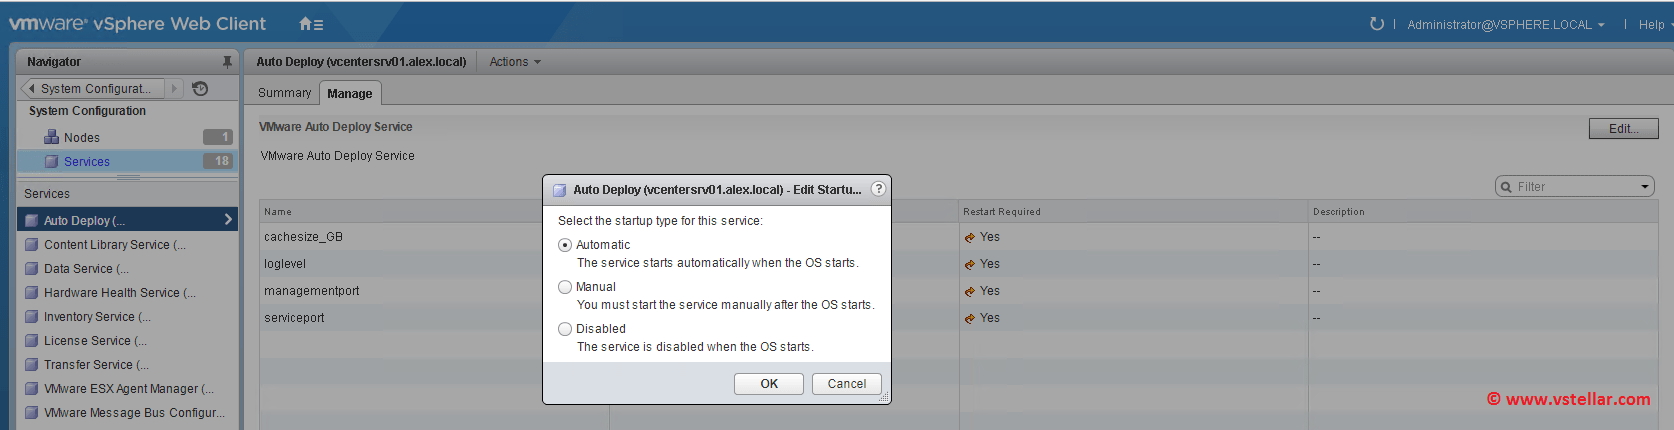 Auto Deploy Configuration in vSphere 6